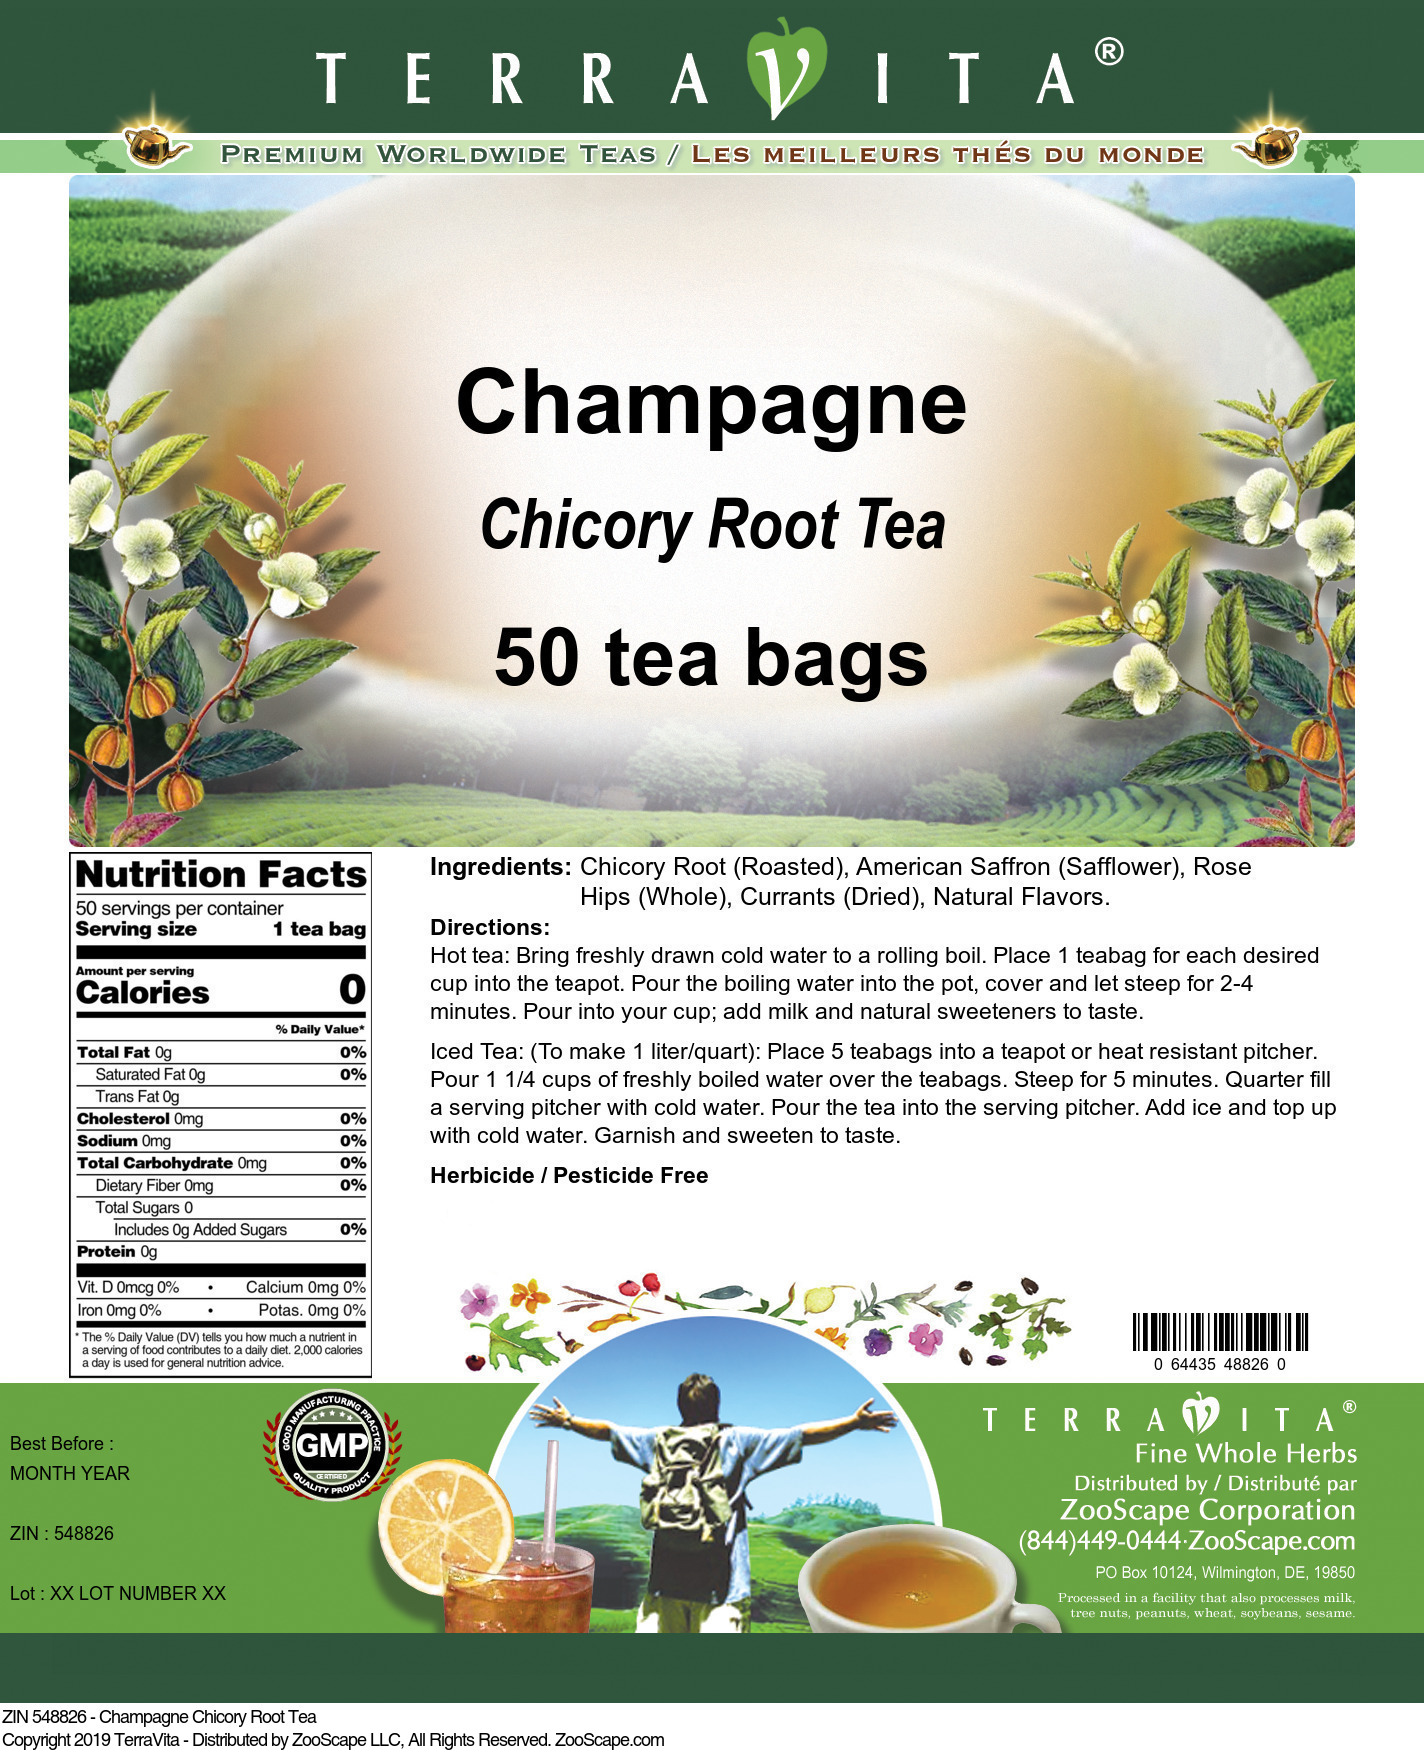 Champagne Chicory Root Tea